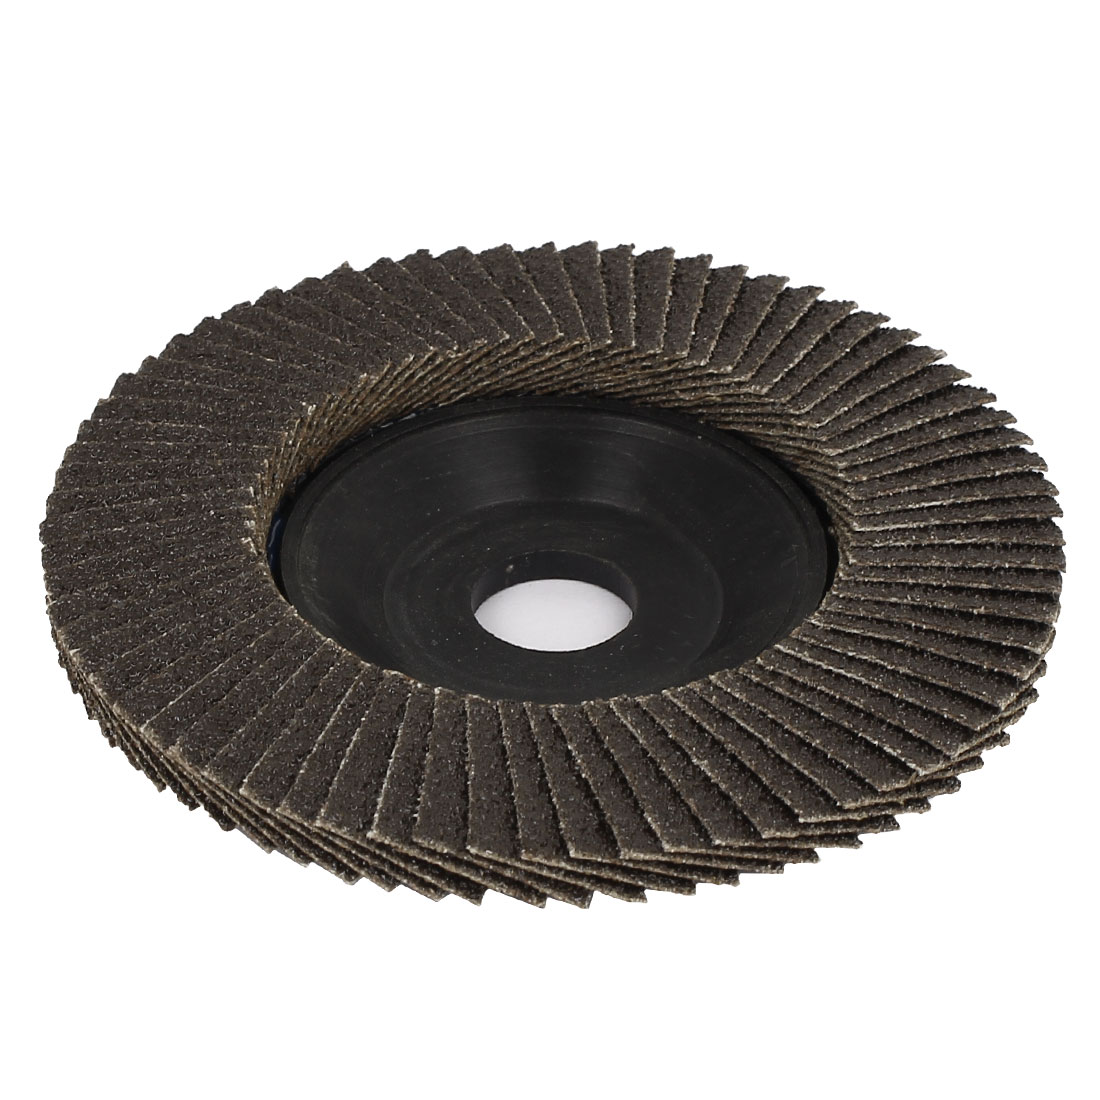 10cm Outside Dia Flap Sanding Disc Grinding Wheels 80 Grit